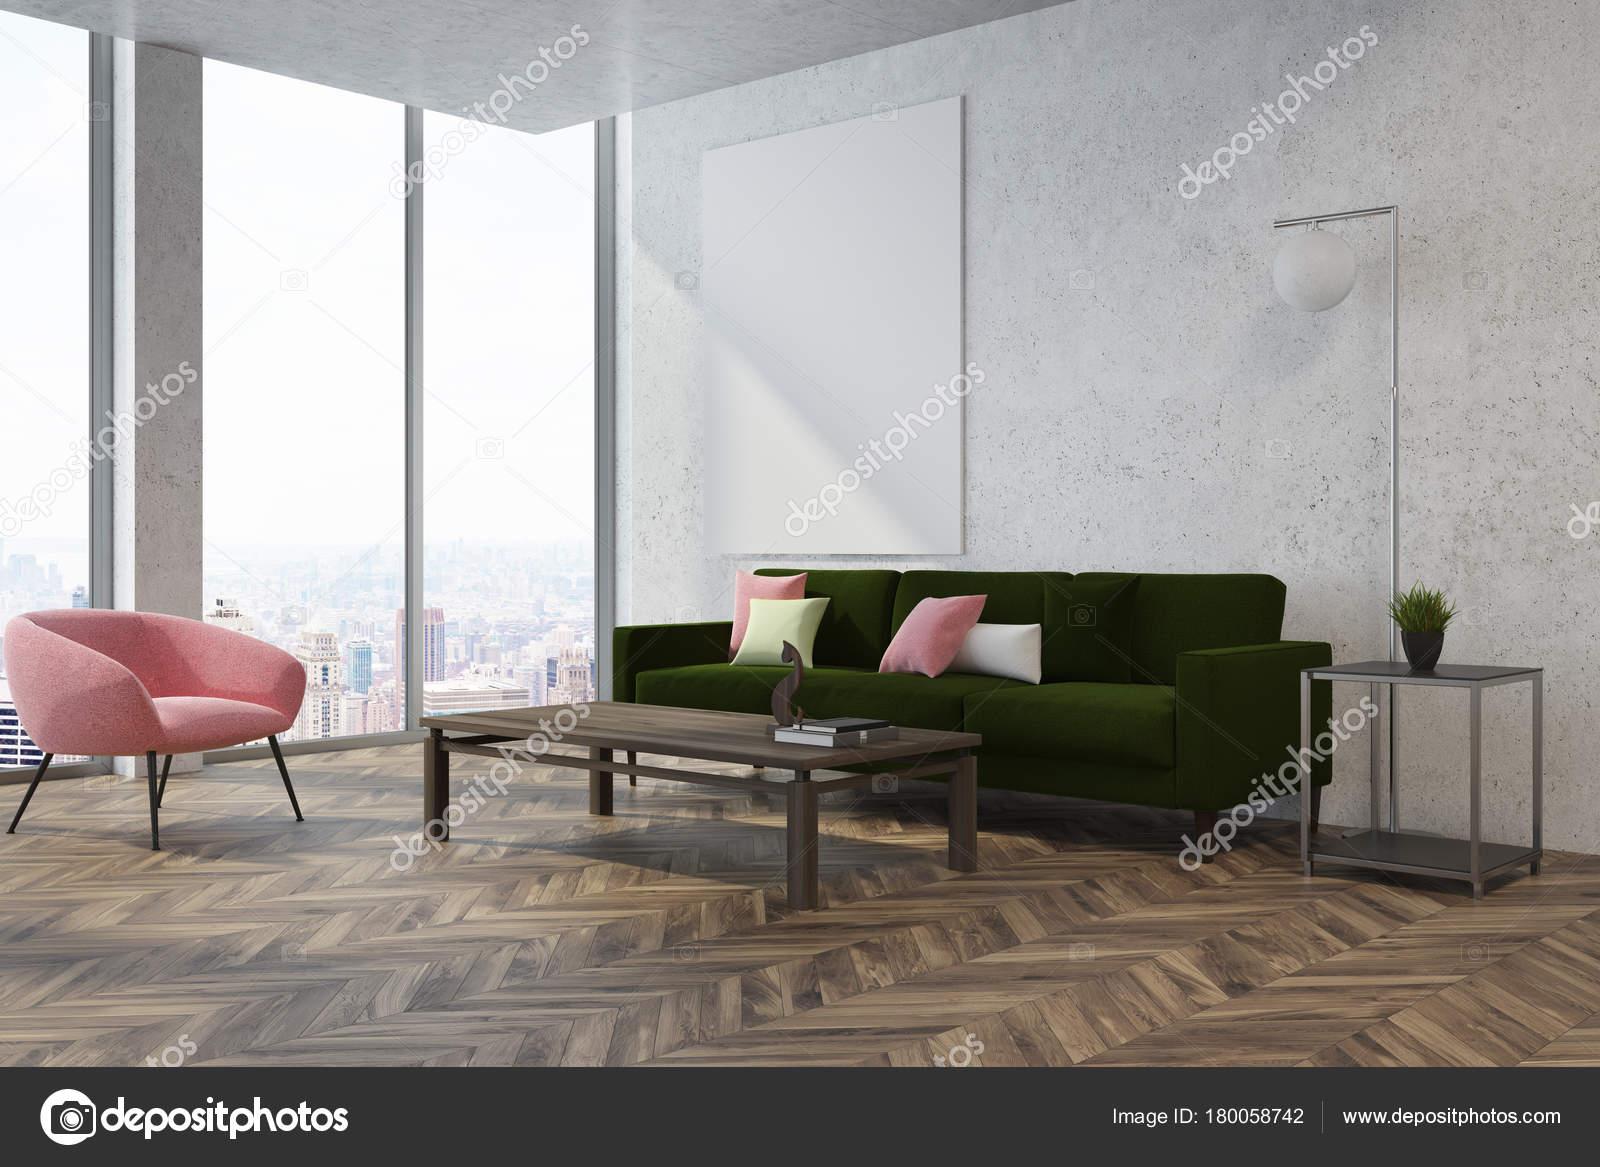 https://st3.depositphotos.com/2673929/18005/i/1600/depositphotos_180058742-stockafbeelding-wit-woonkamer-hoek-roze-fauteuil.jpg